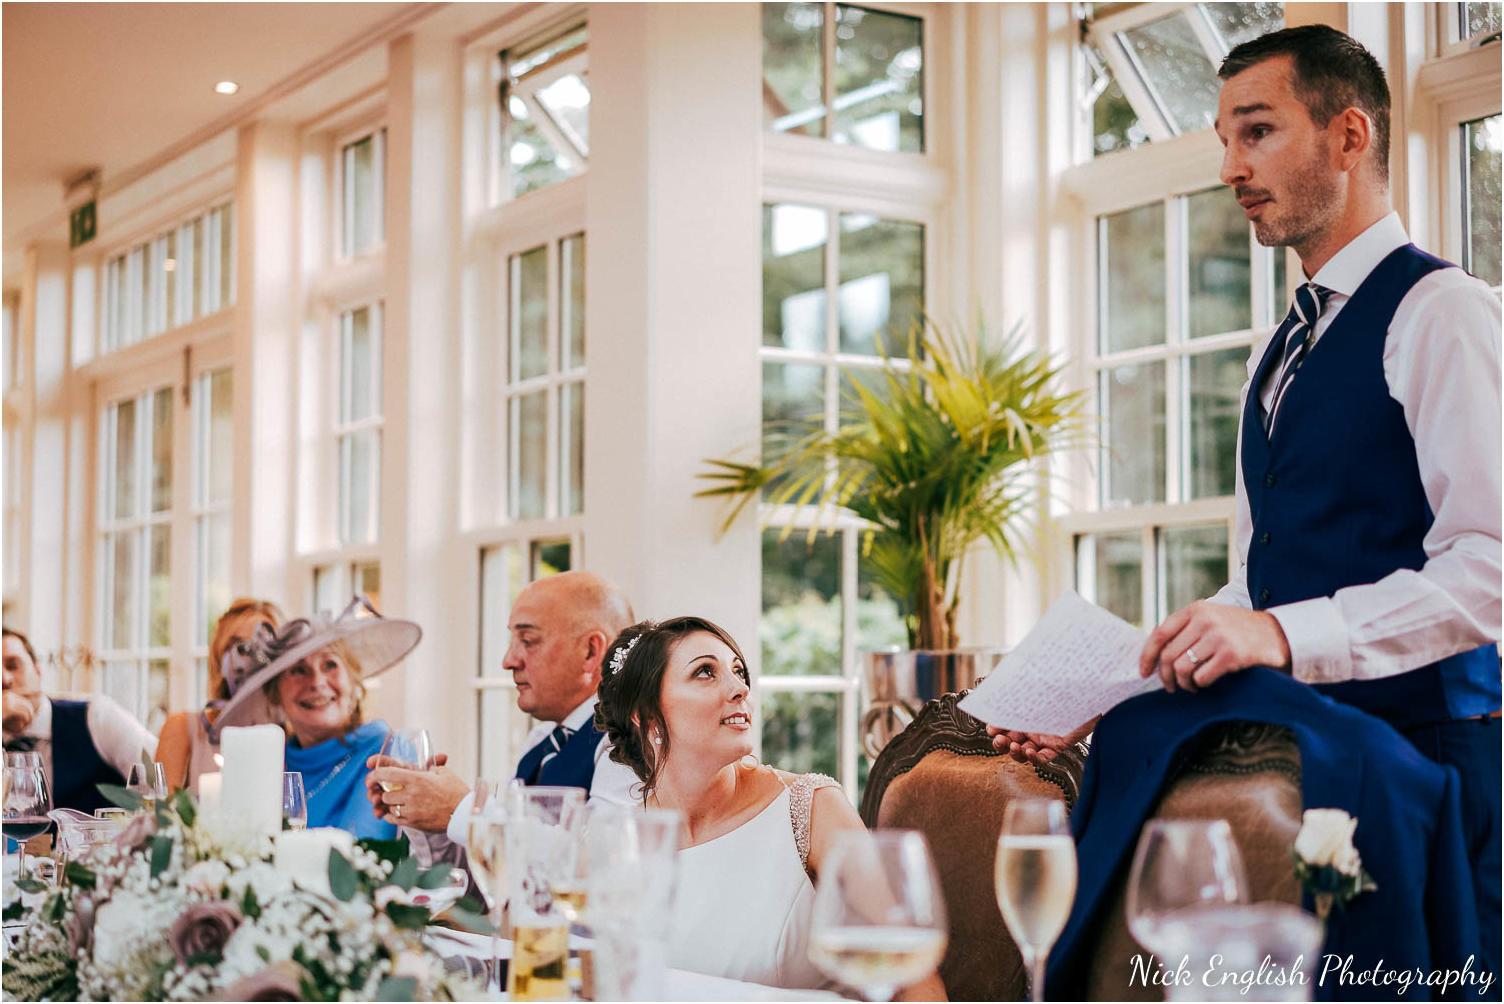 Mitton_Hall_Wedding_Summer_Photograph-104.jpg